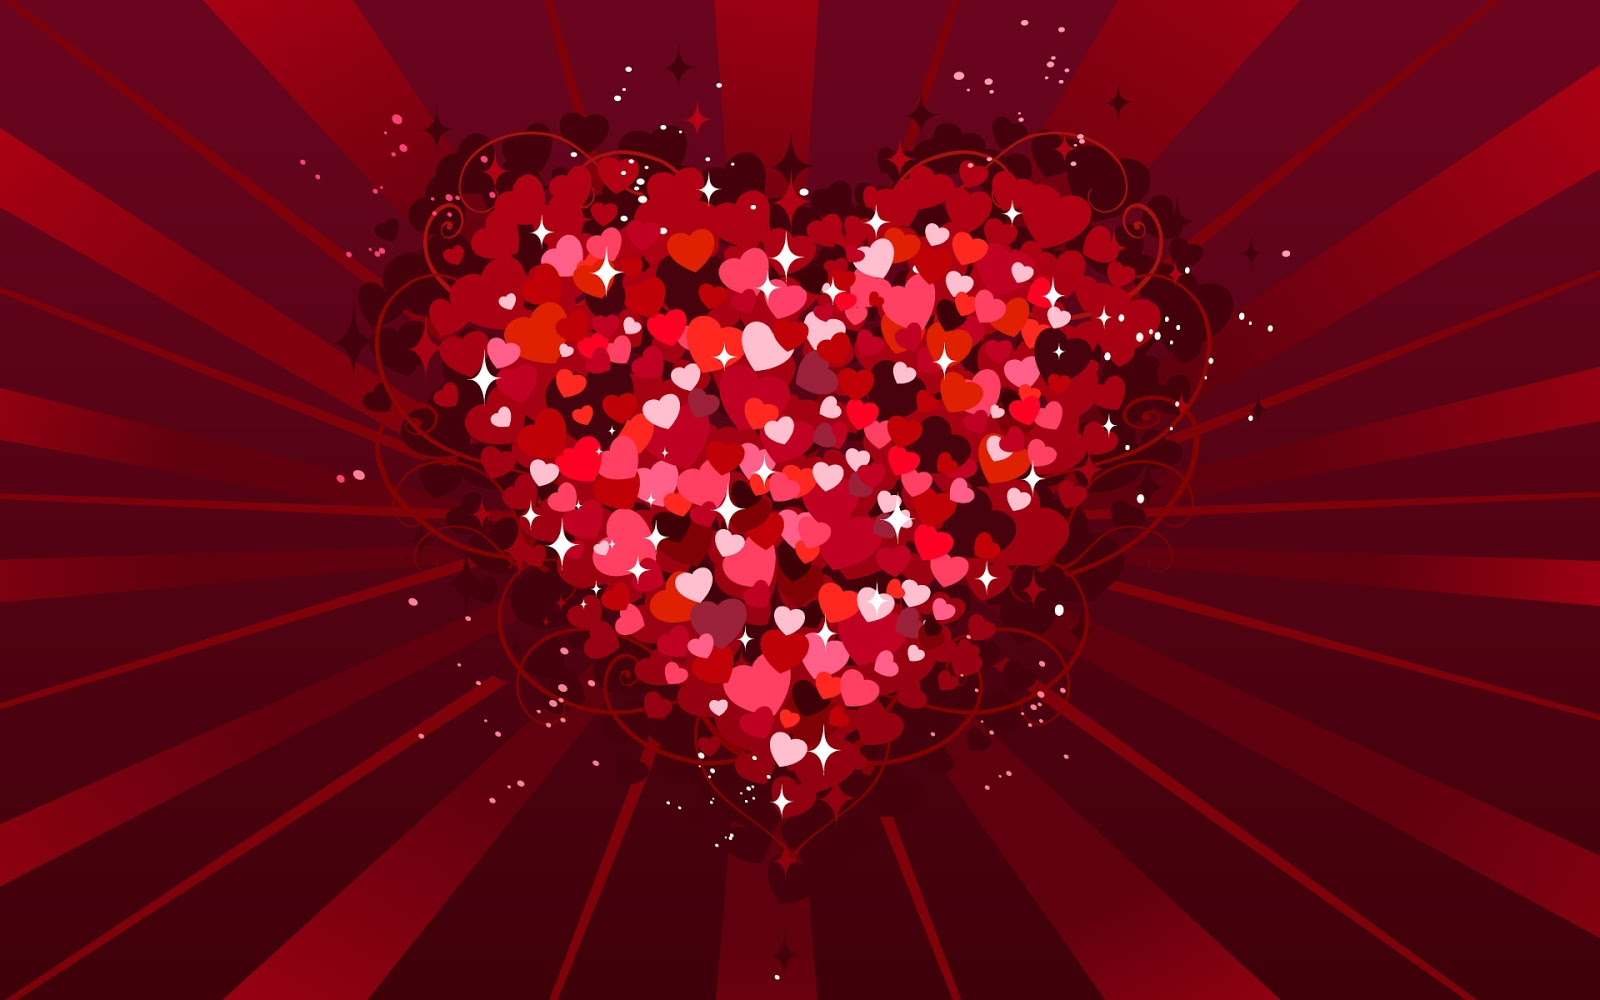 http://3.bp.blogspot.com/-sMaoBgFCPus/UMhEMAQmcRI/AAAAAAAAKro/QfYYLtrvB2Y/s1600/Million+Hearts+HD+Love+Wallpaper.jpg